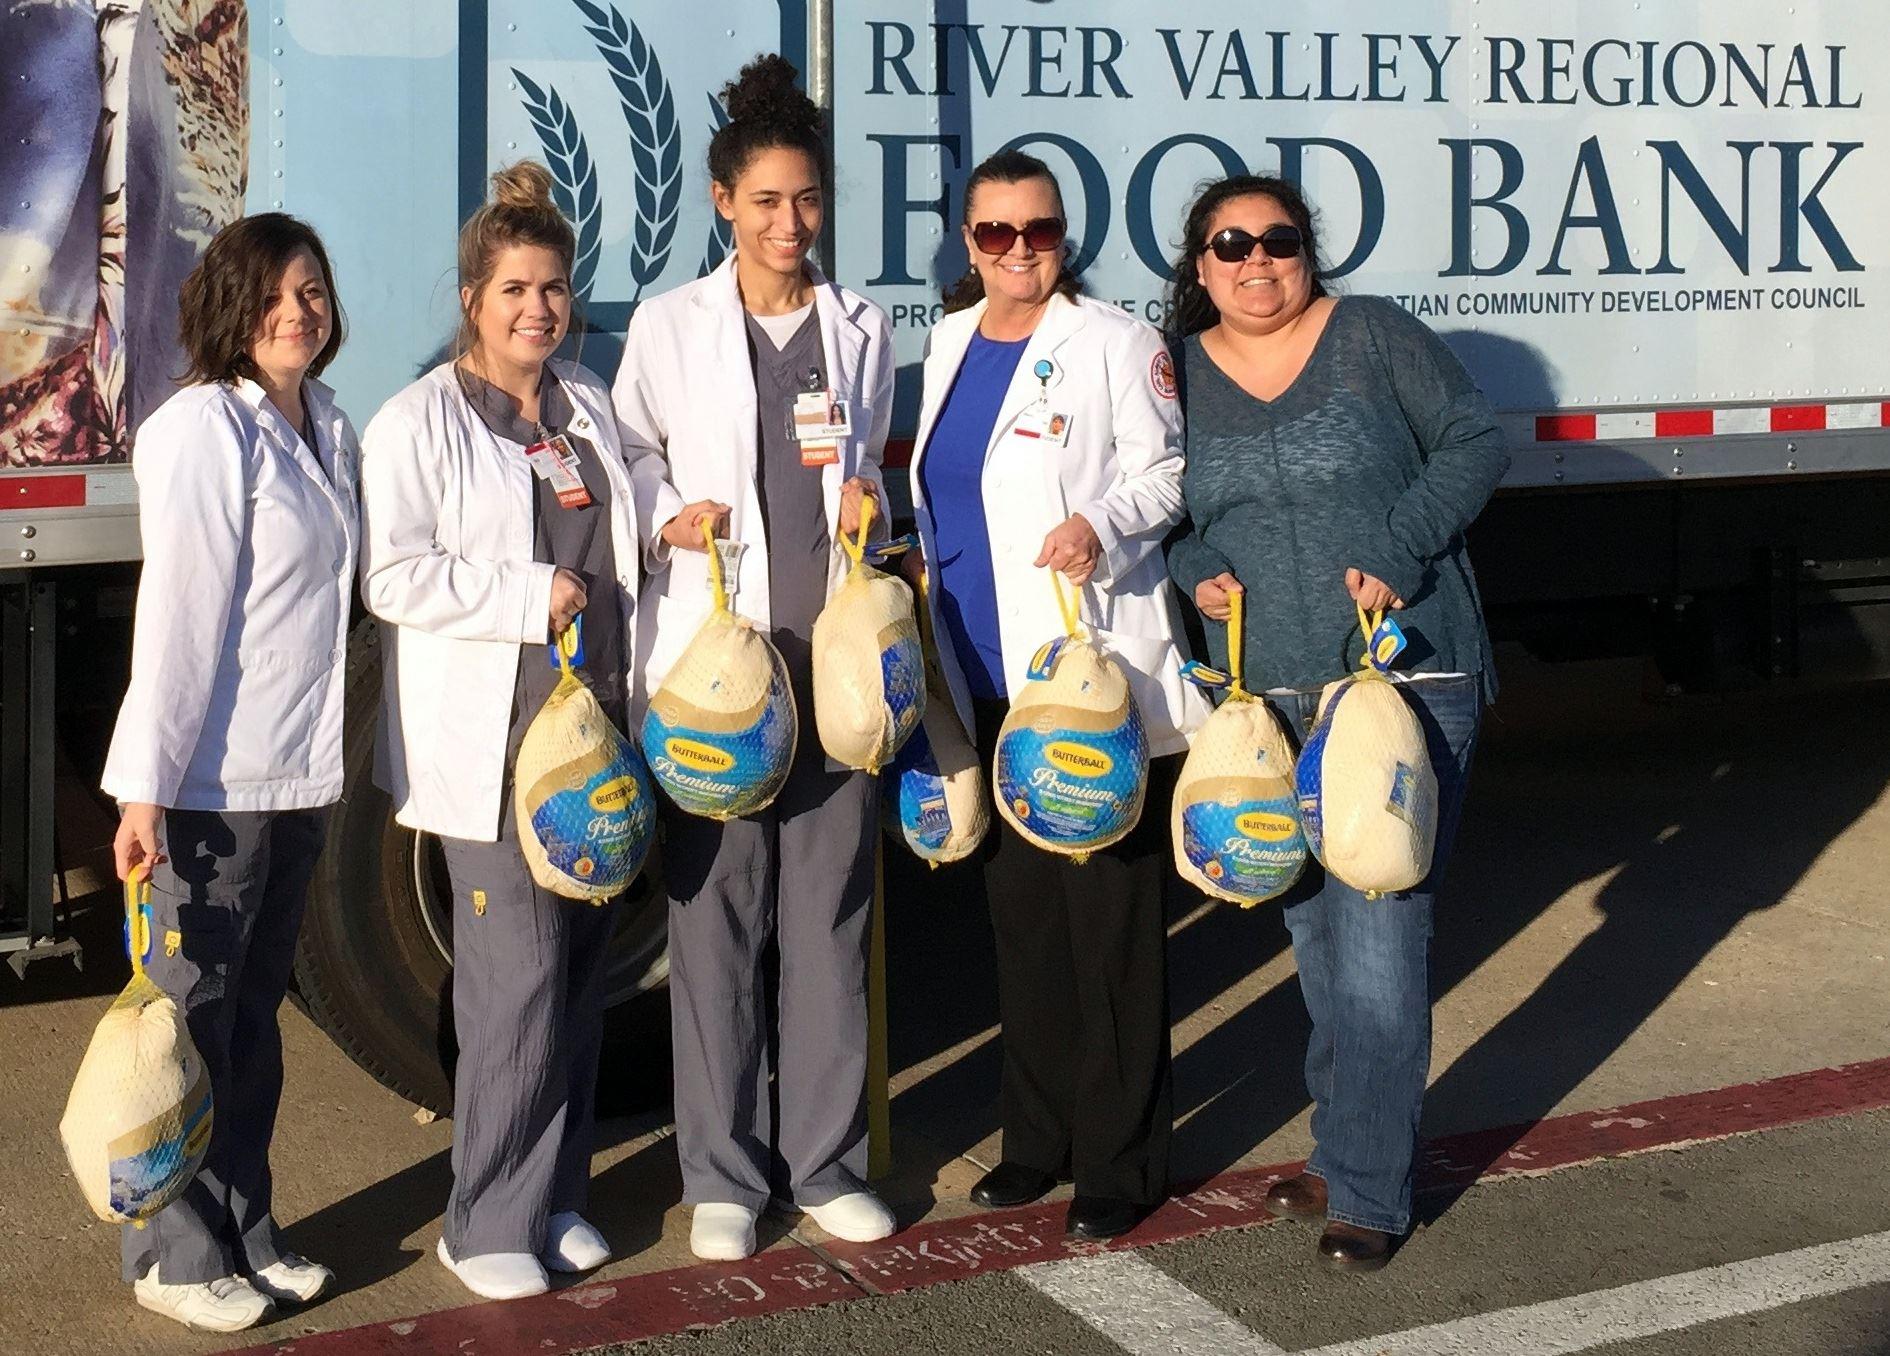 Courtesy River Valley Regional Food Bank/Facebook